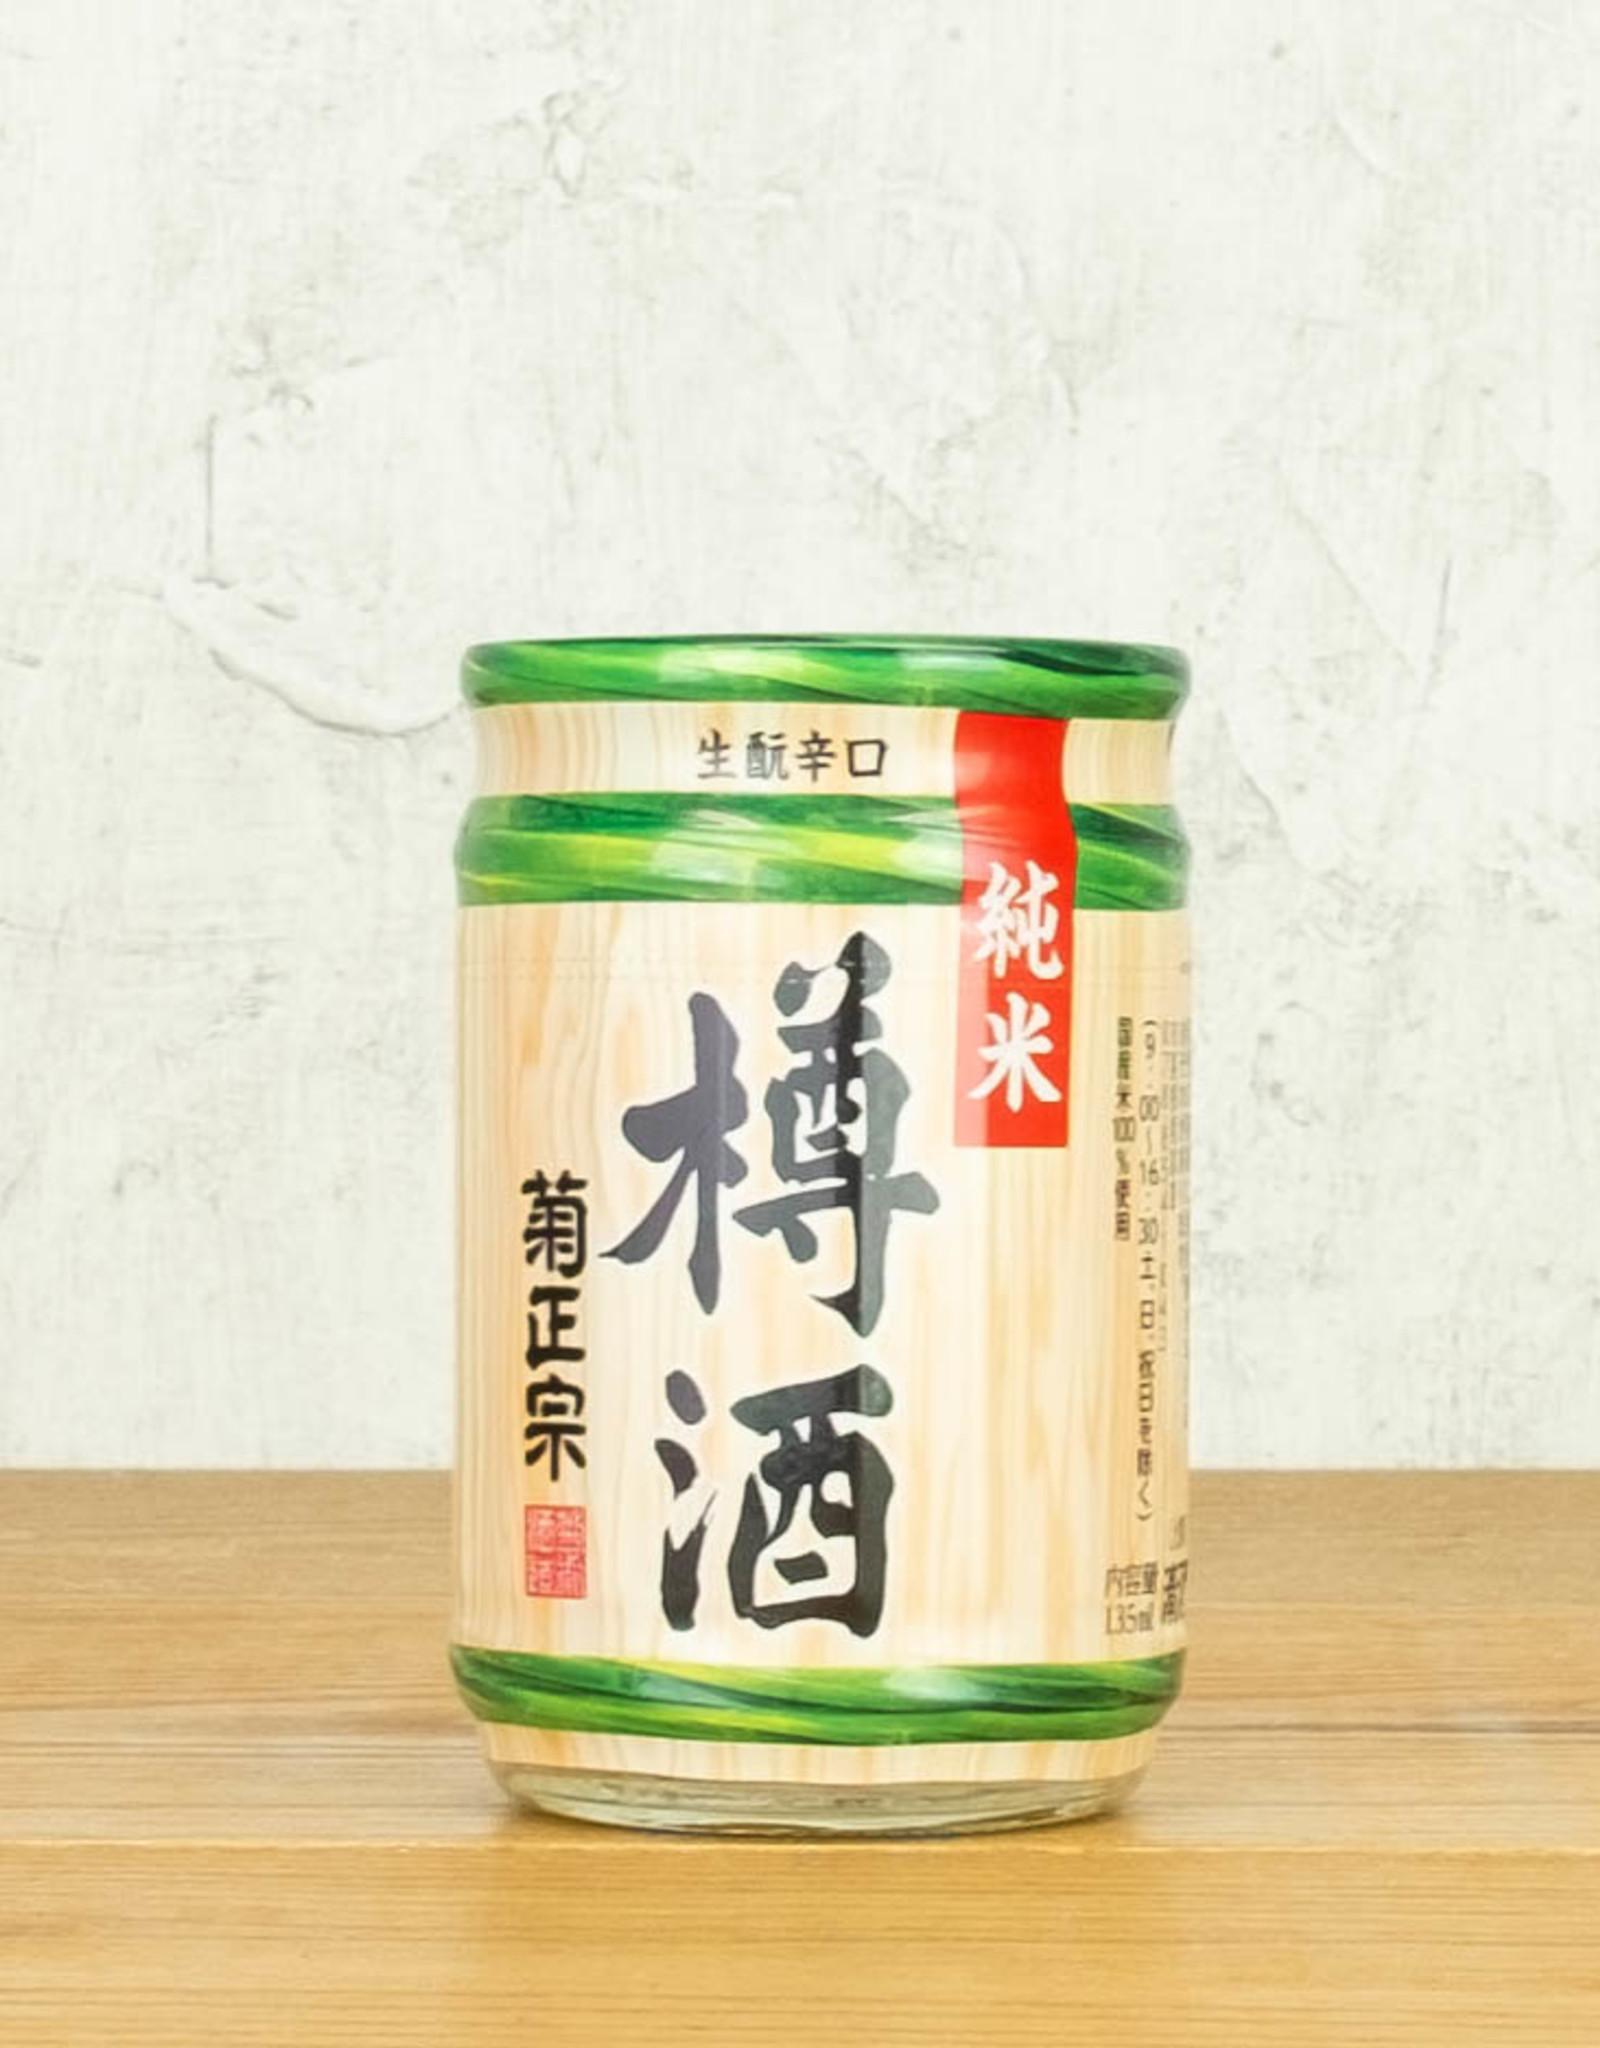 Kiku-Masamune Junmai Taru Sake 135ml